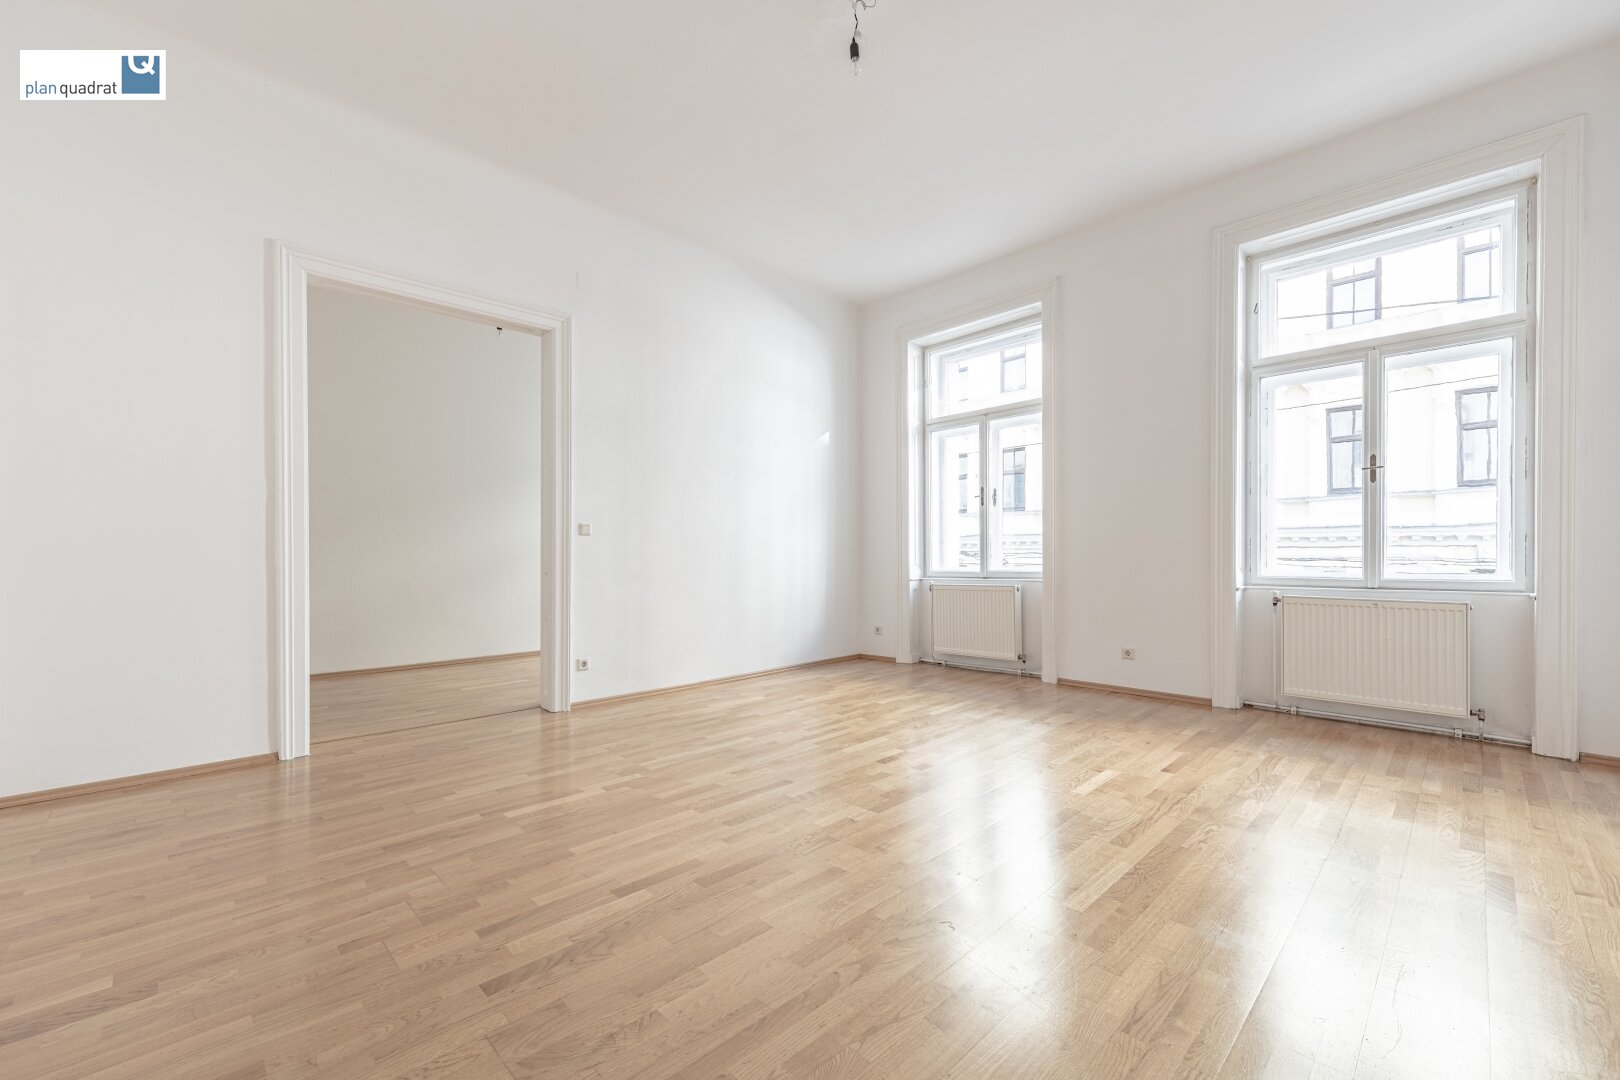 Zimmer 2 (gem. Wohnungsgrundriss; zentral begehbar)